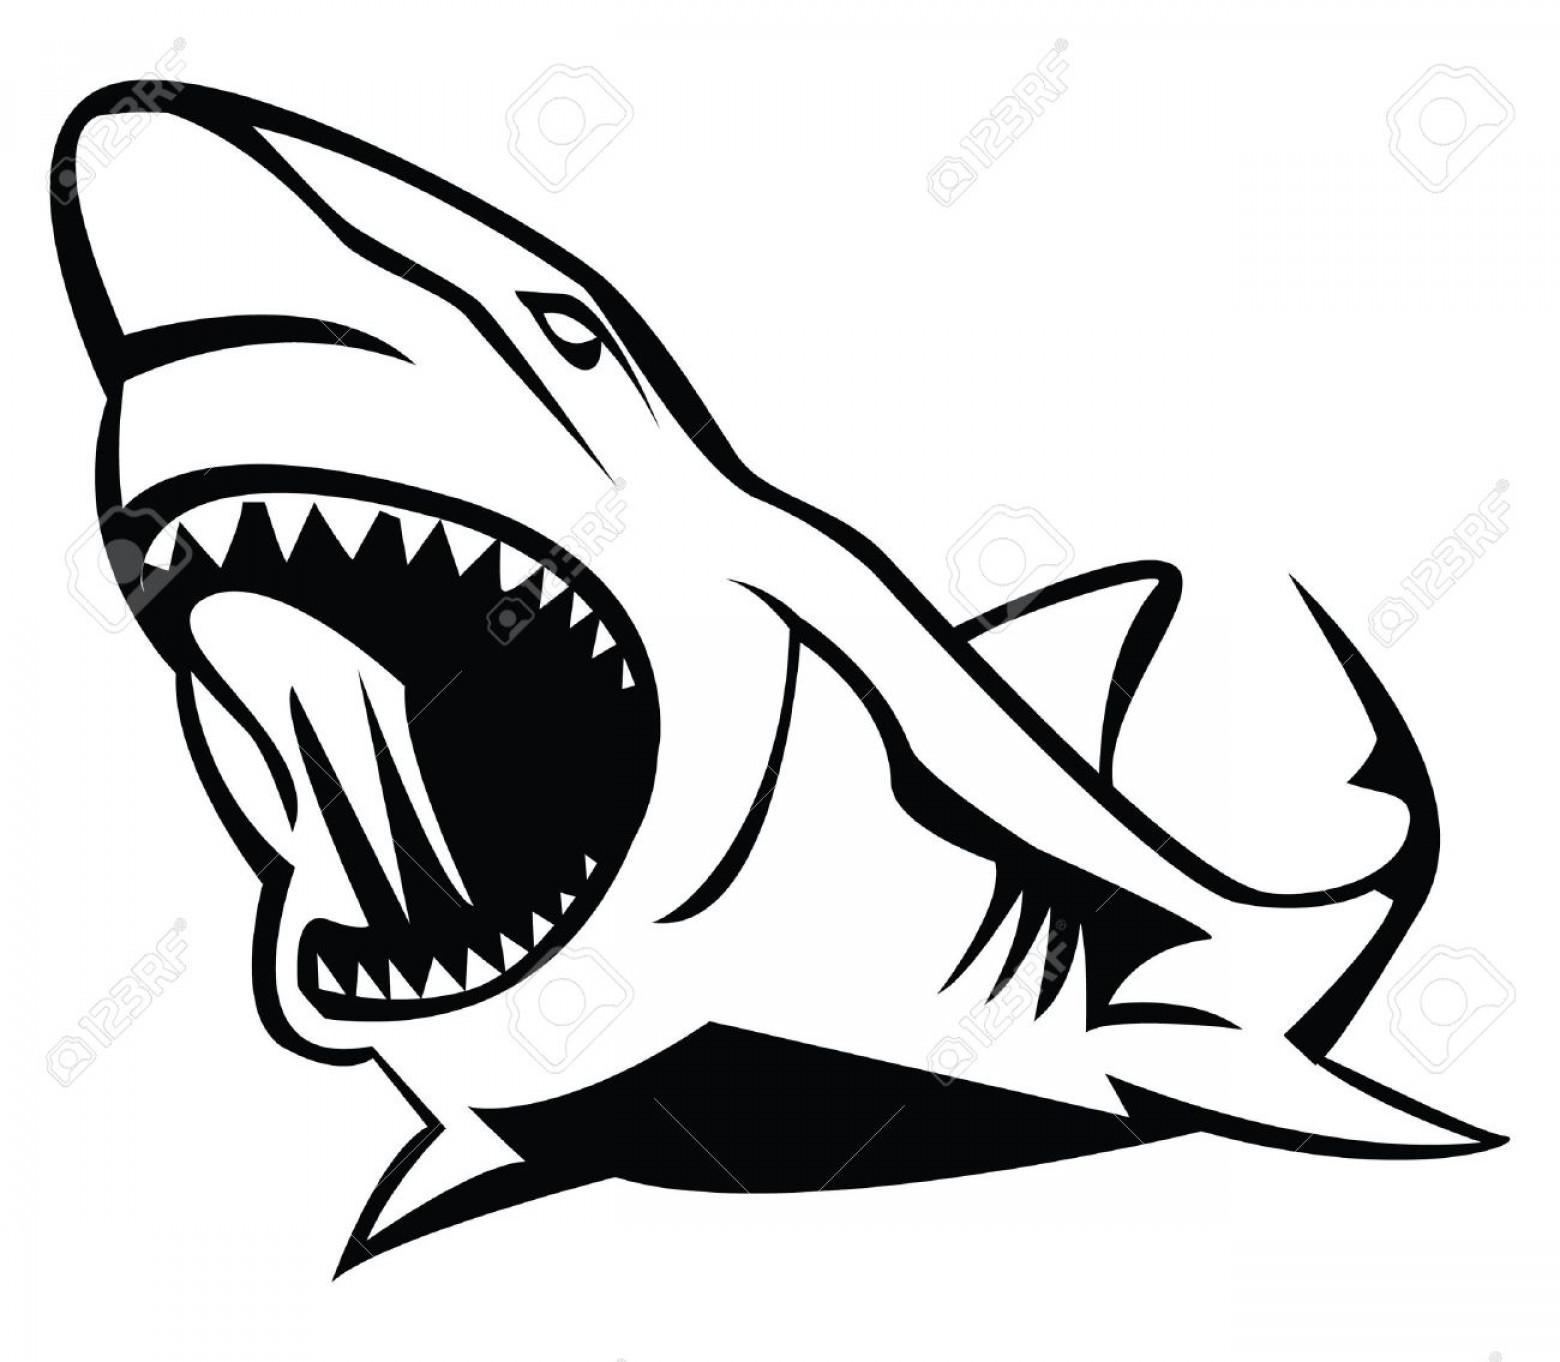 Unique toons images design. Clipart shark vector